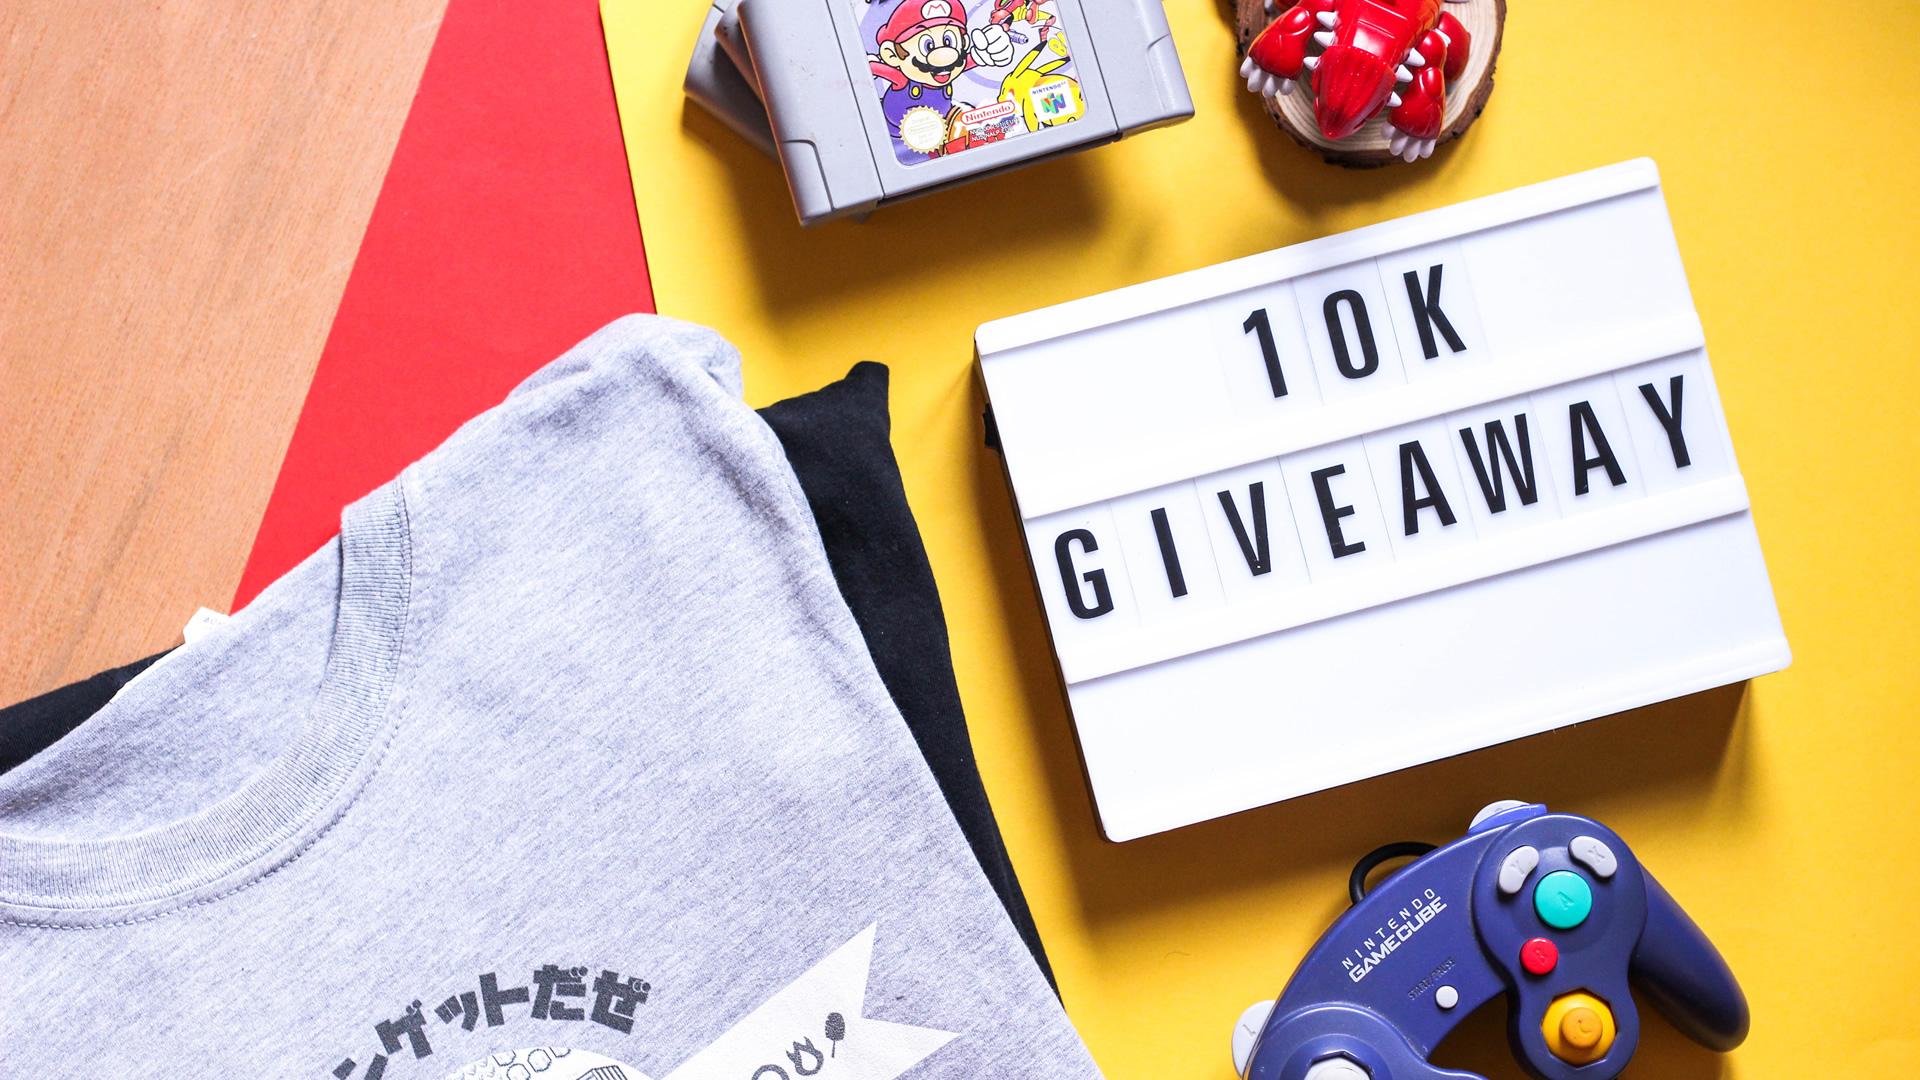 Win a TeeChu Tee in our 10k Giveaway